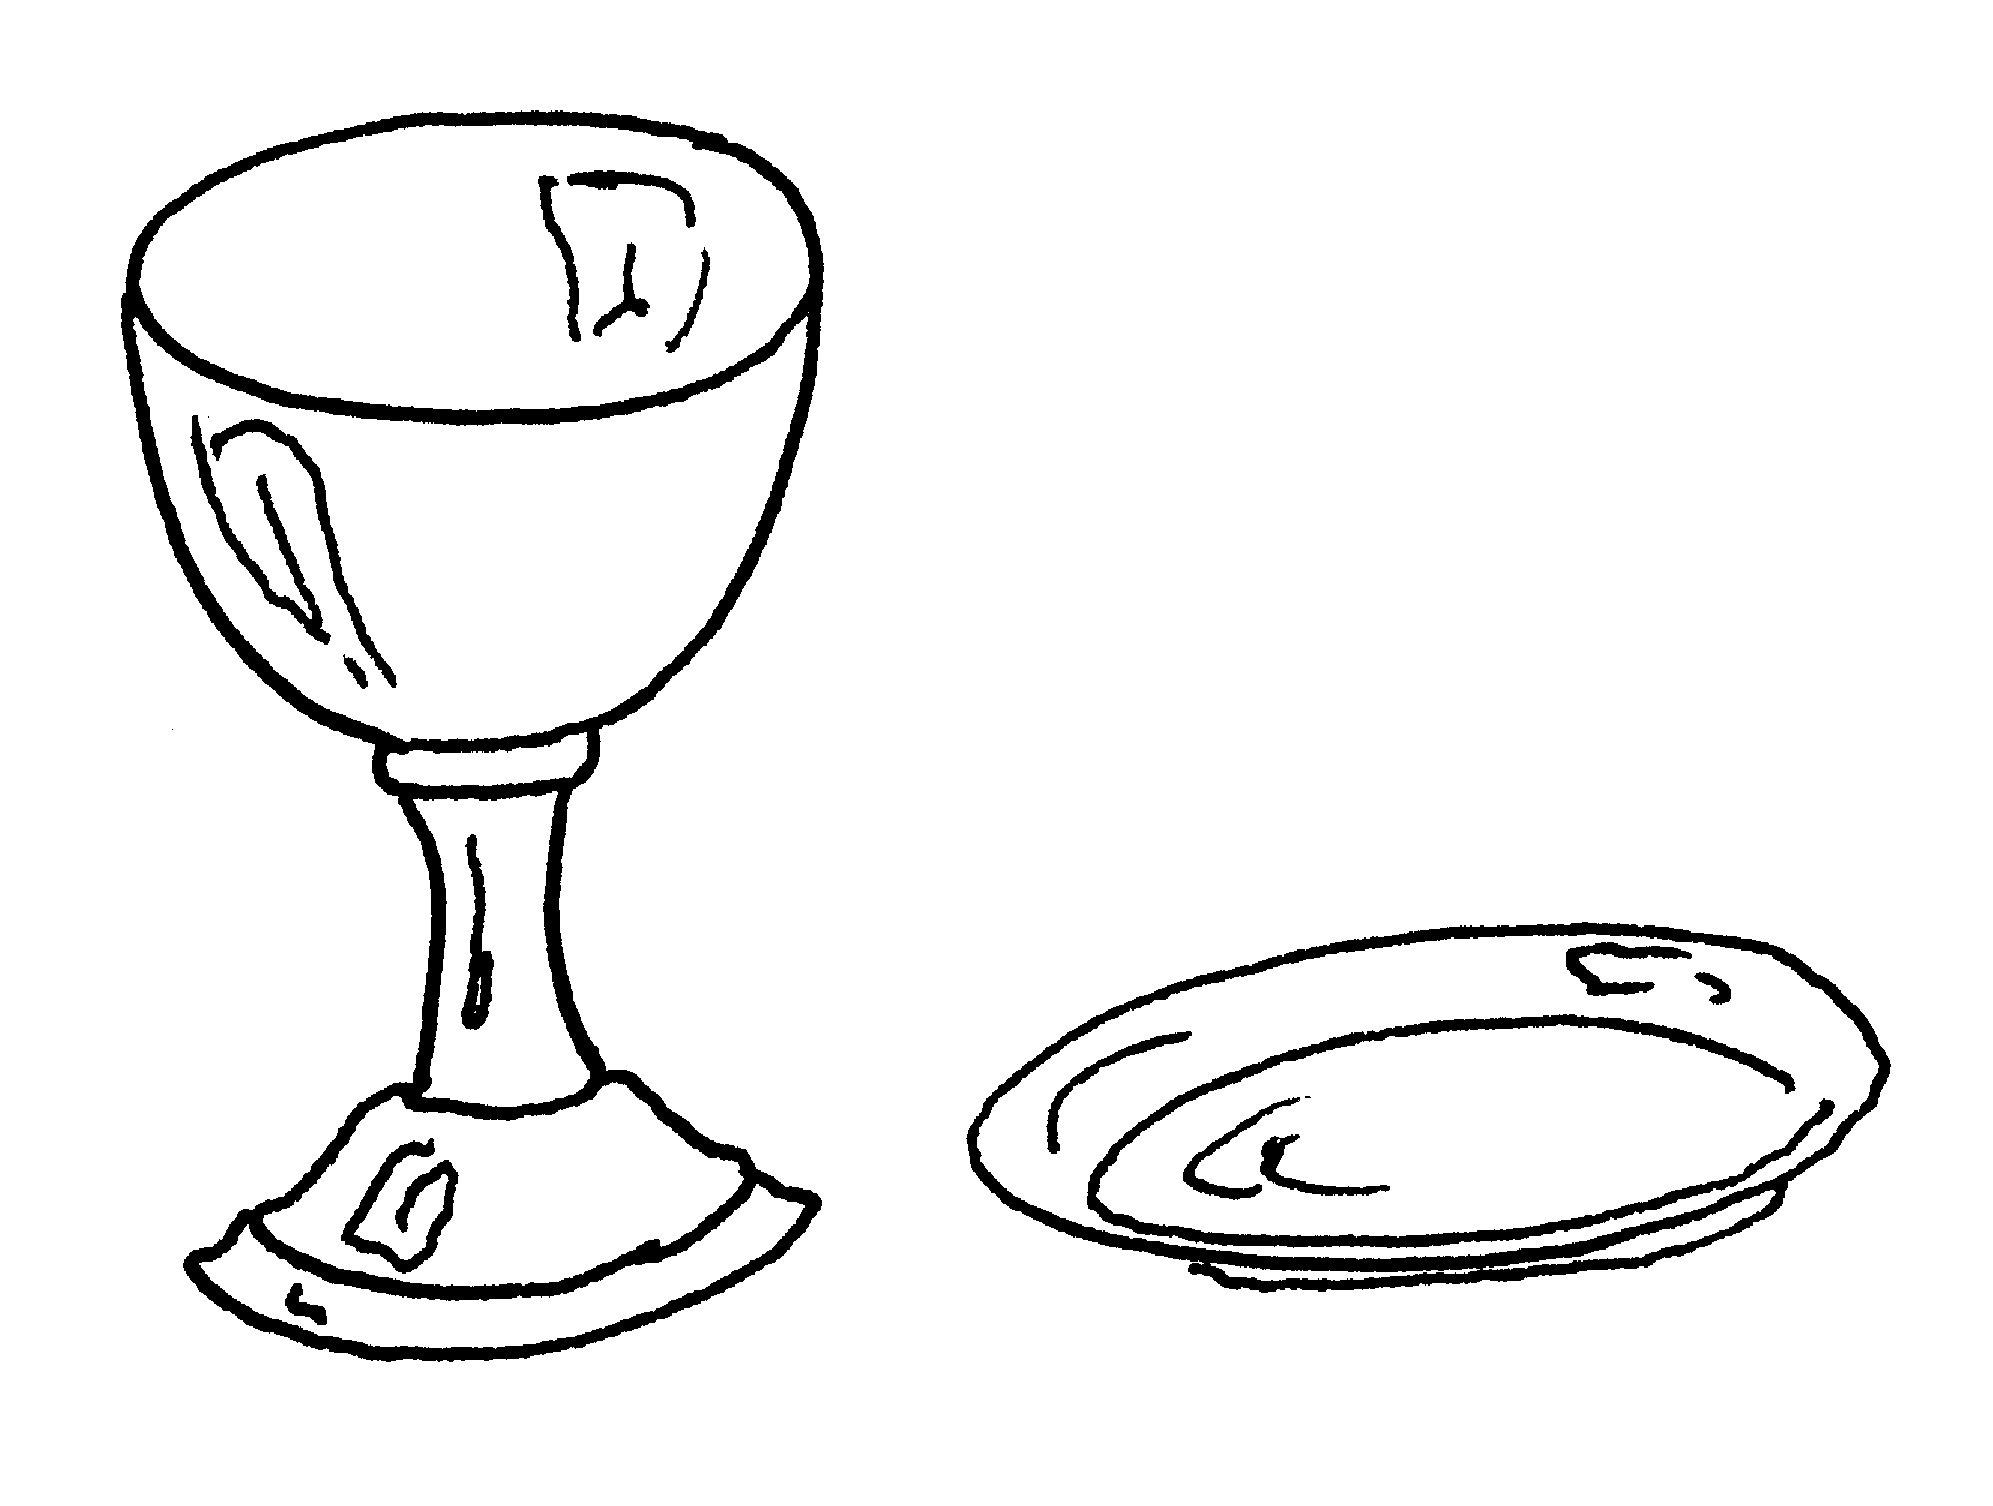 Communion Chalice Clipart Clipart Suggest